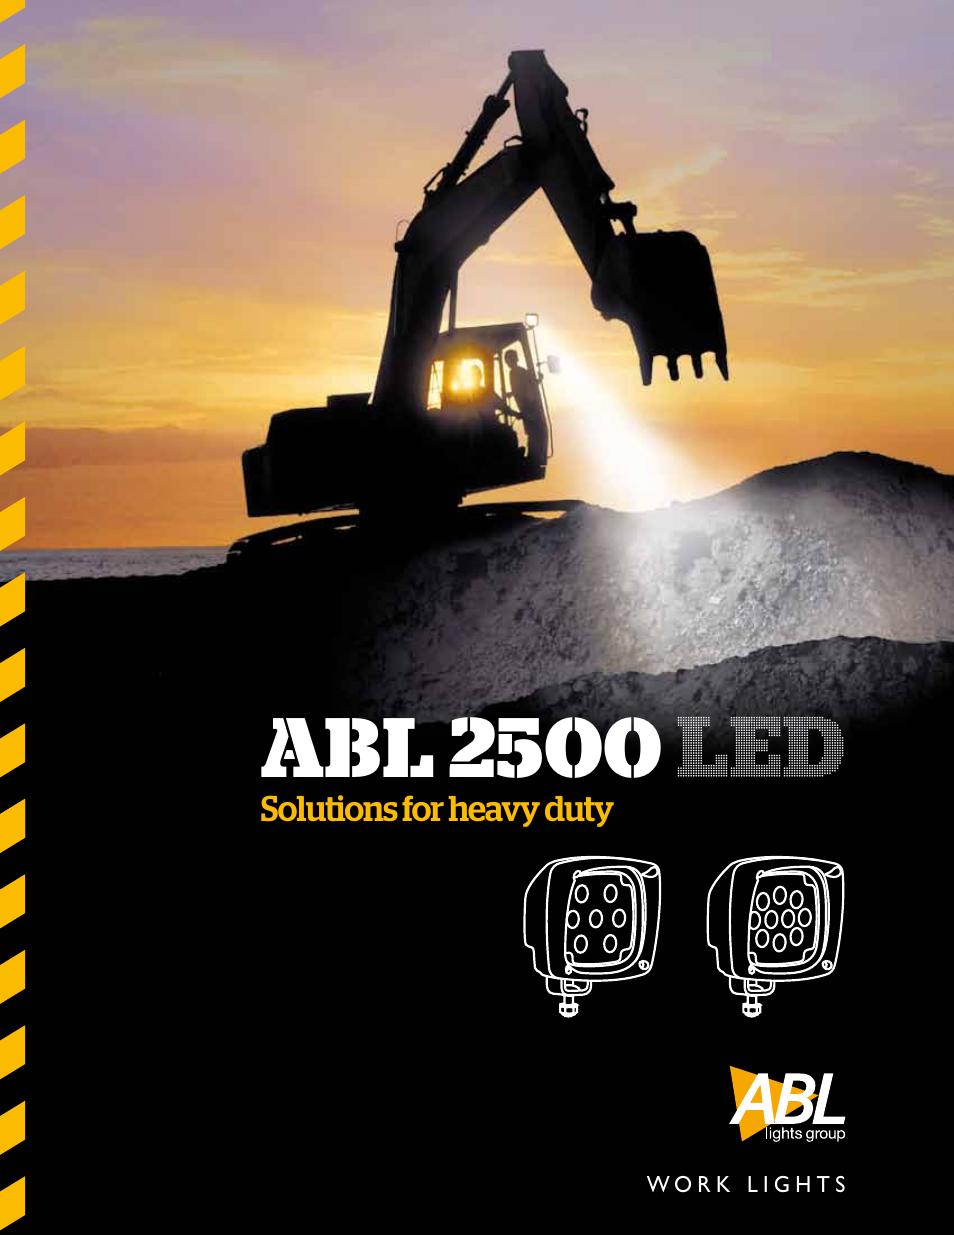 abl lights group abl 2500 led 5000 user manual